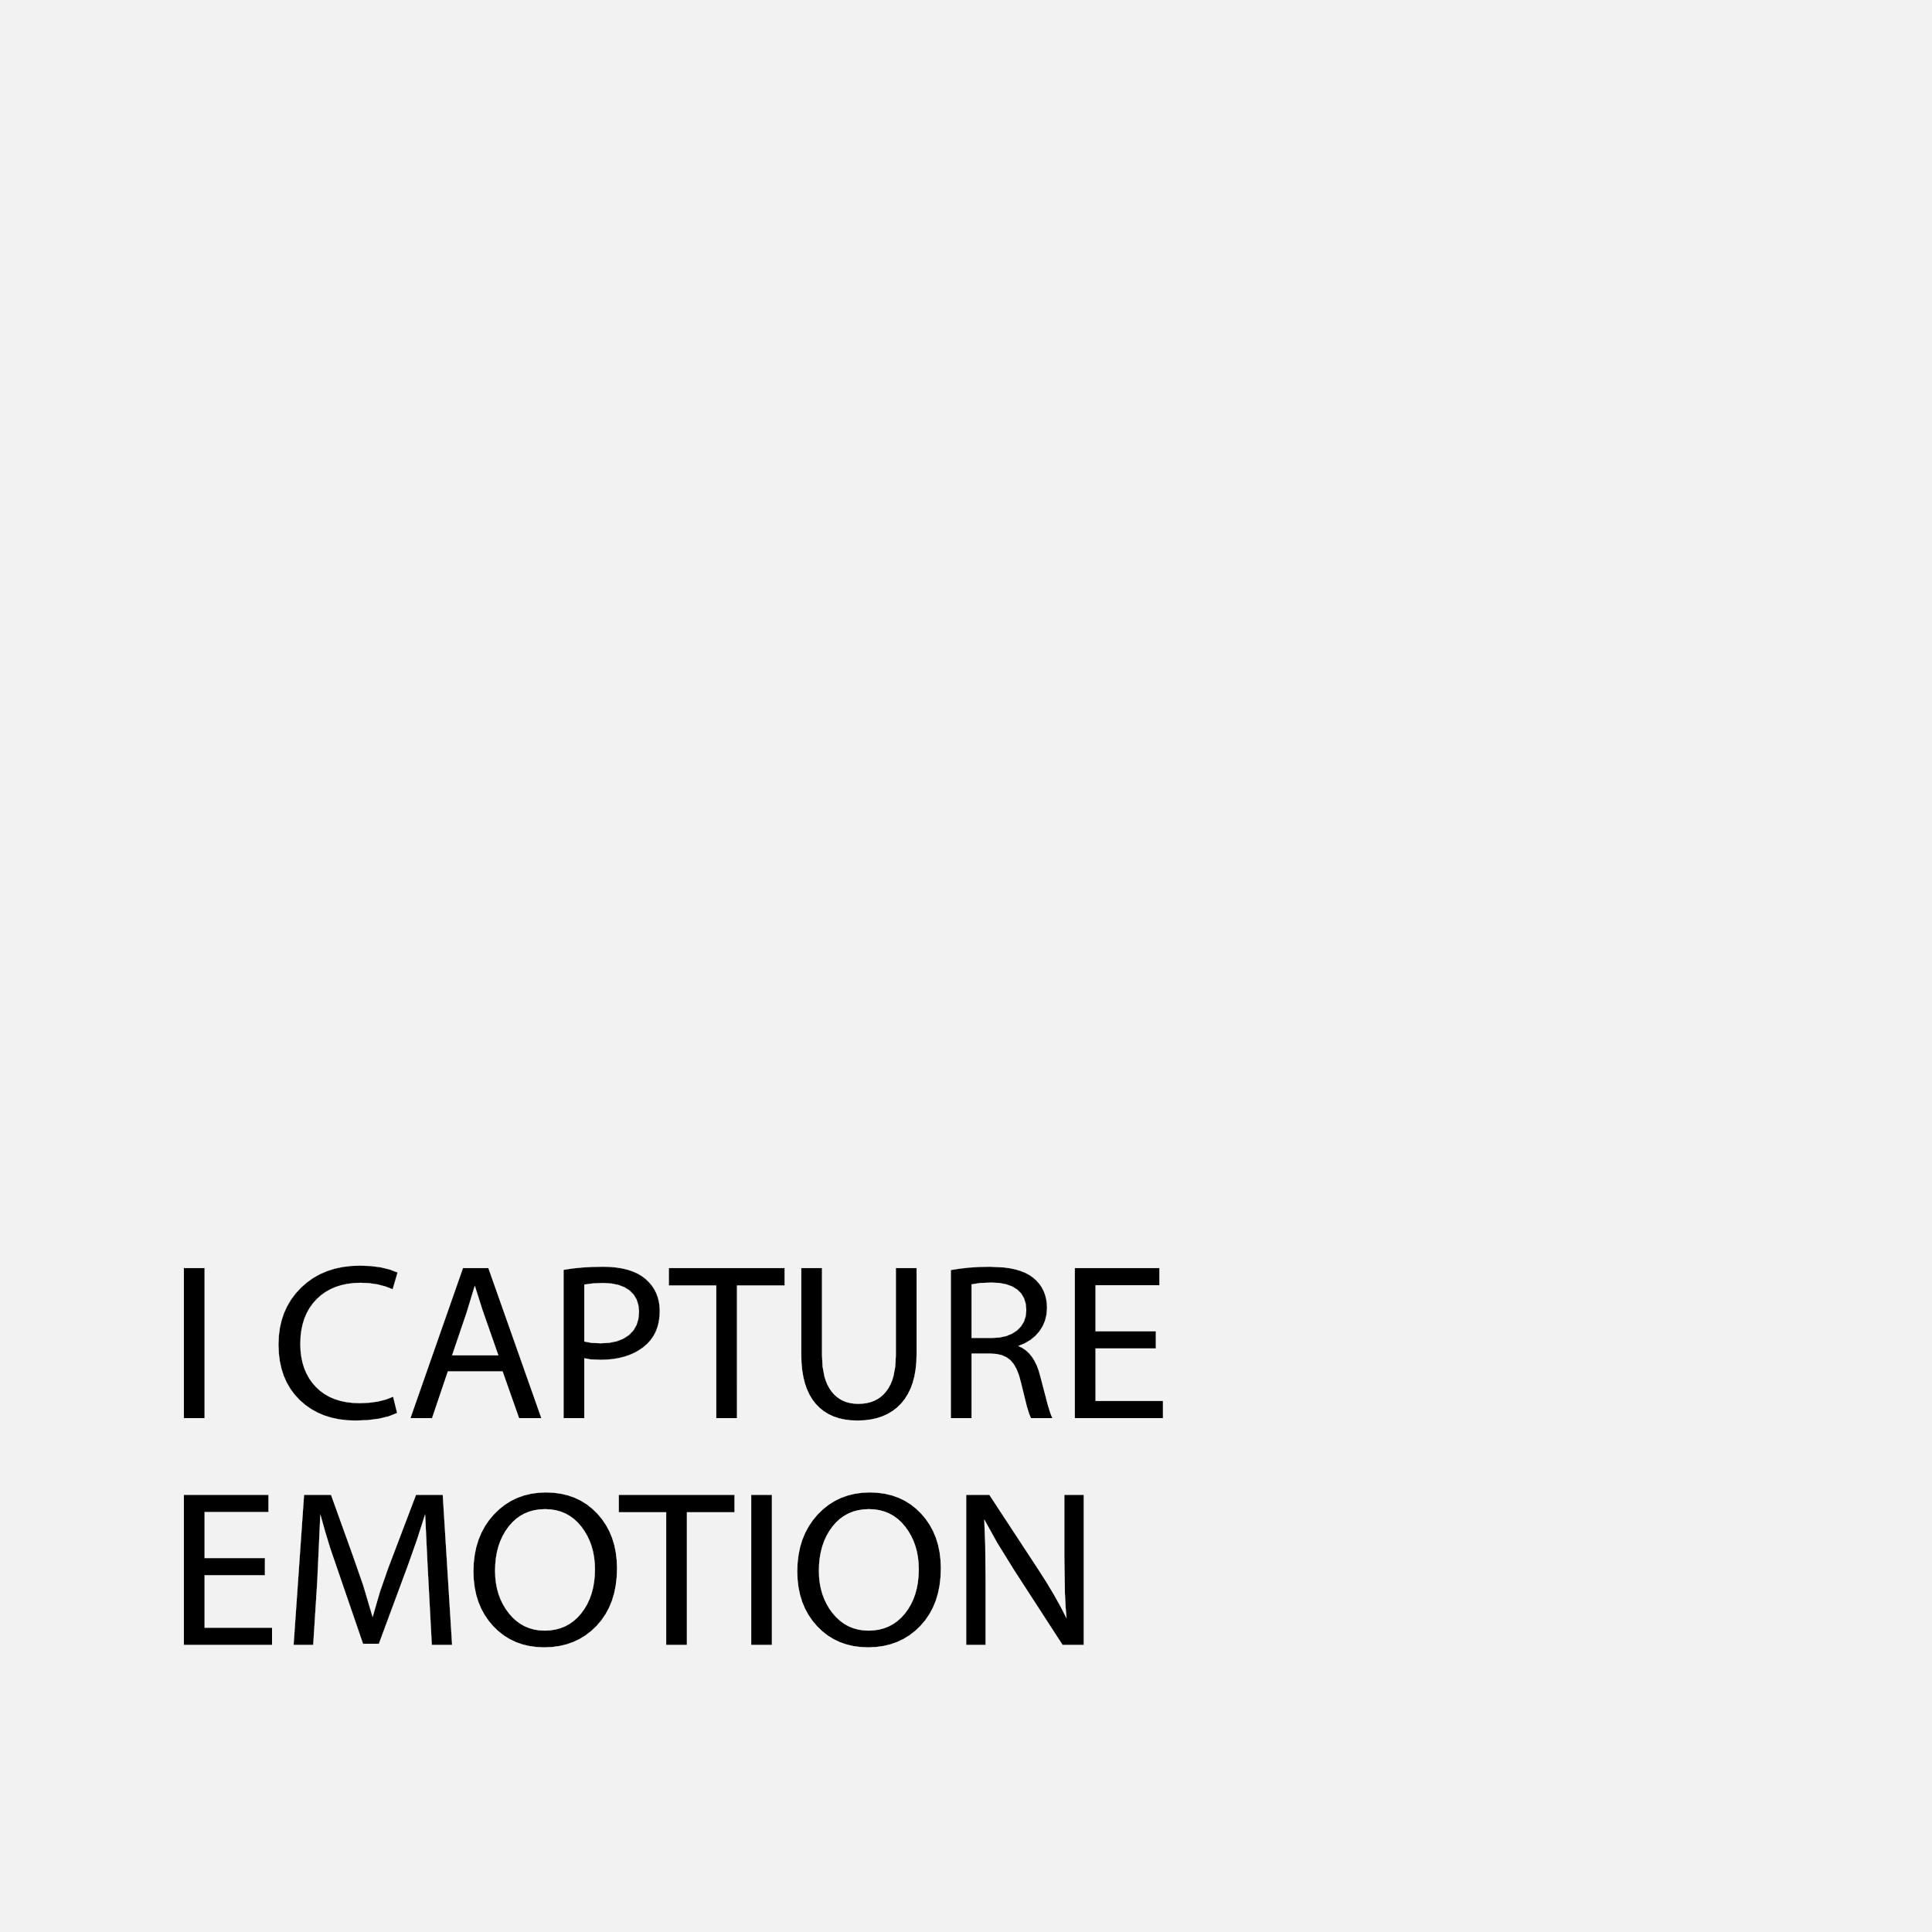 EmotionCapture95Grey.jpg